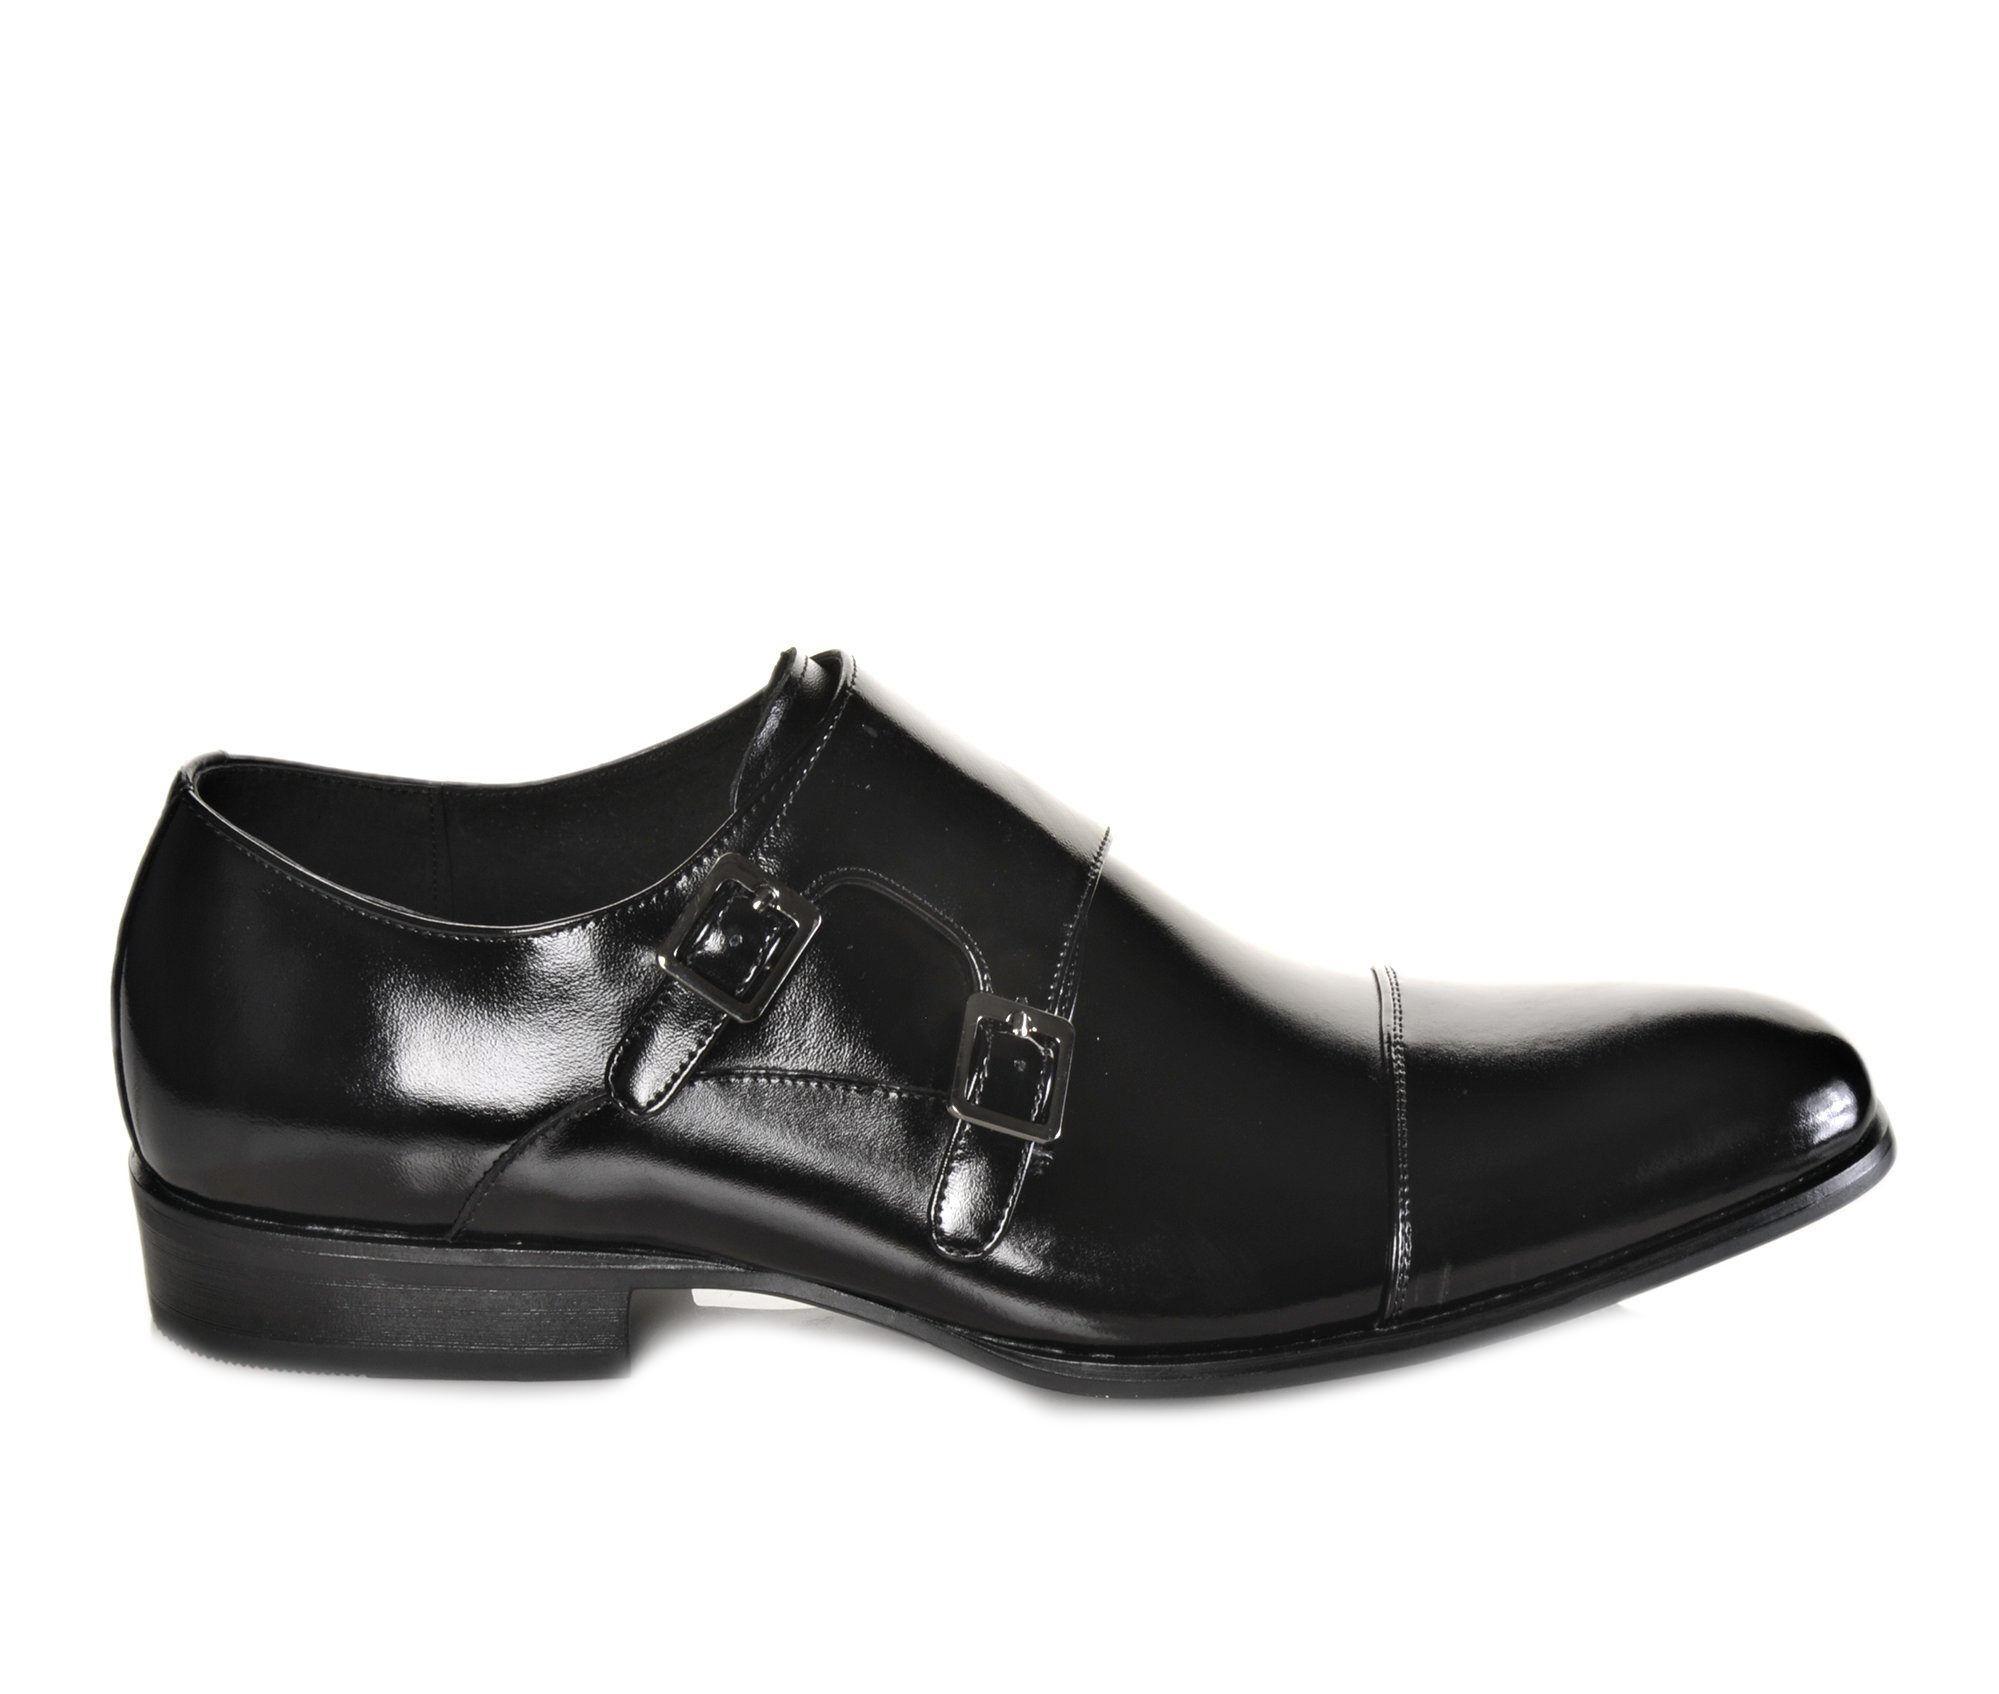 Men's Stacy Adams Gordon Dress Shoes Black